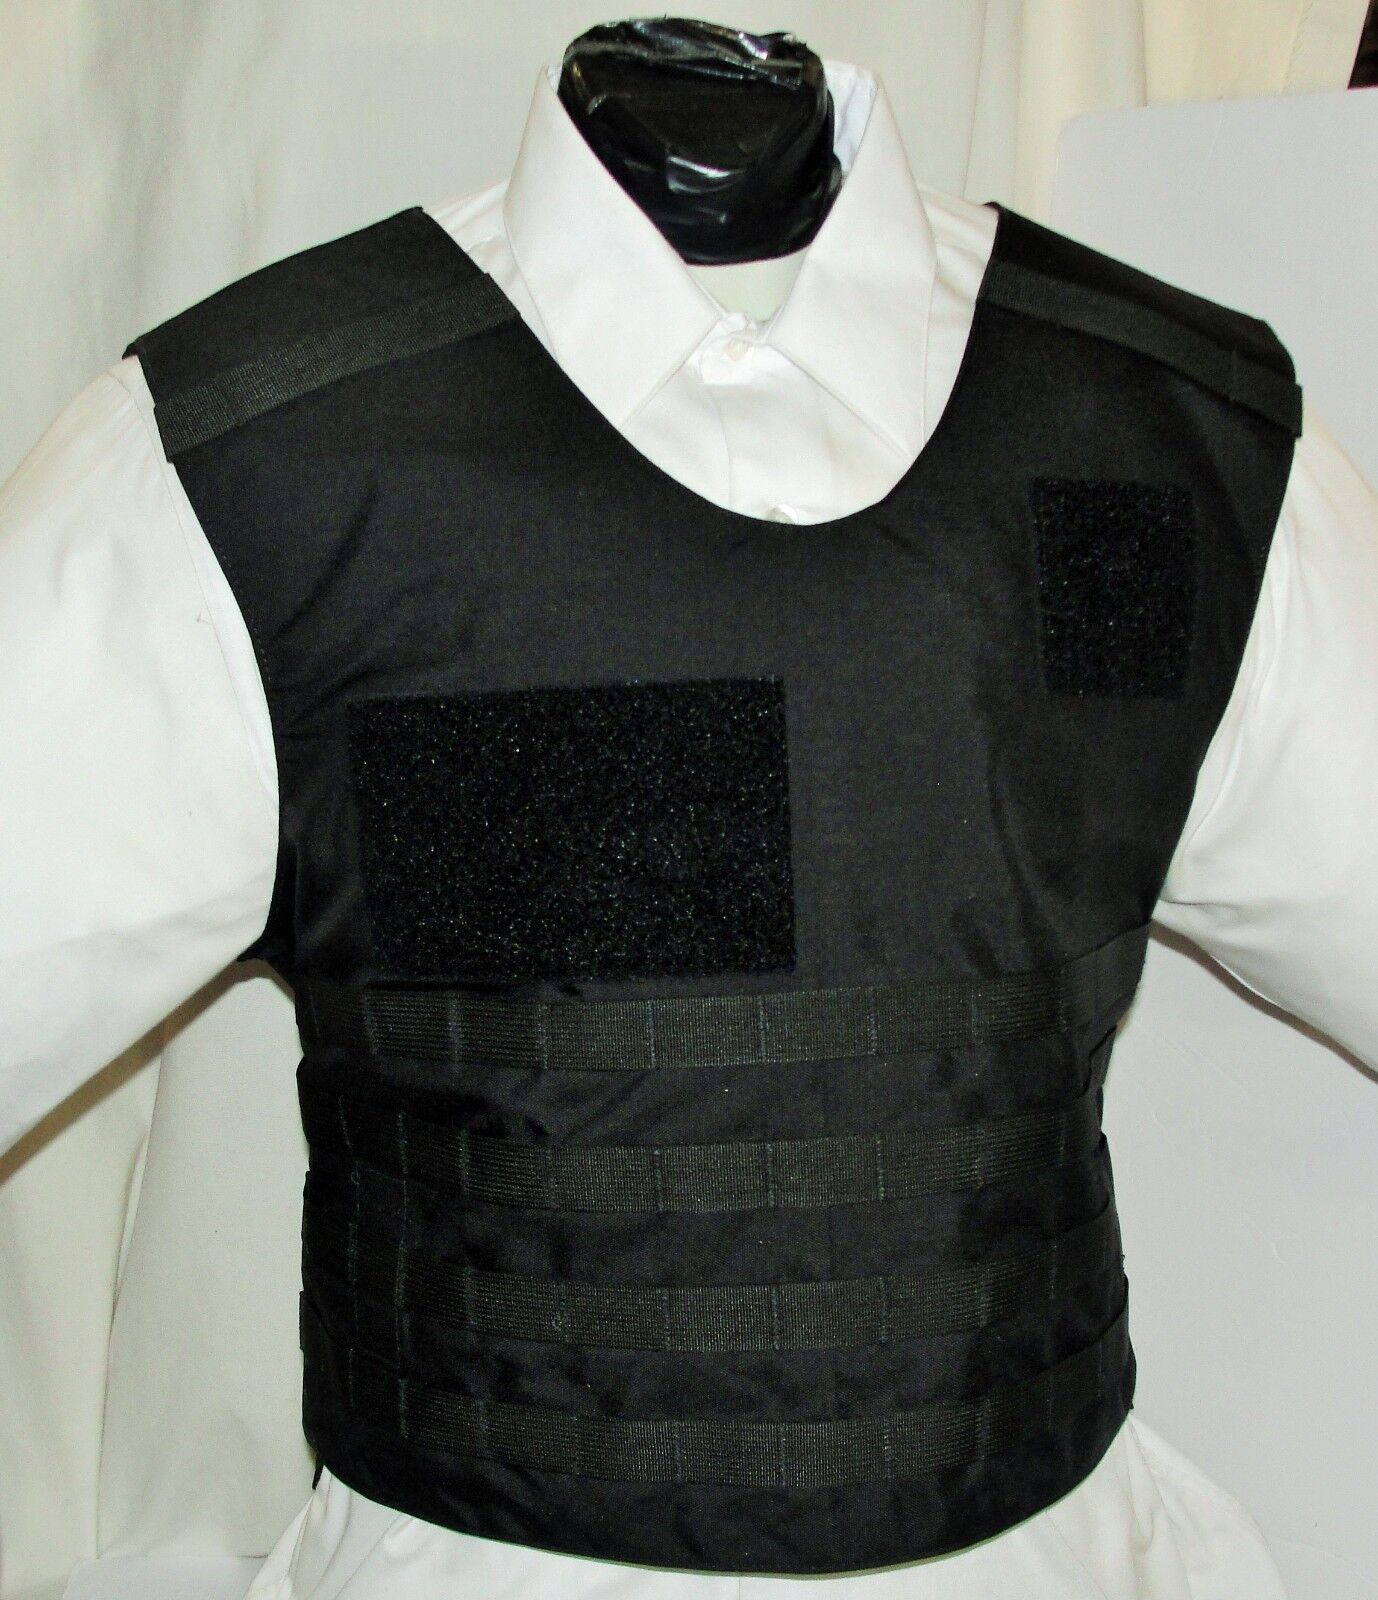 New XL Female Tactical Carrier Level IIIA  Body Armor BulletProof Vest